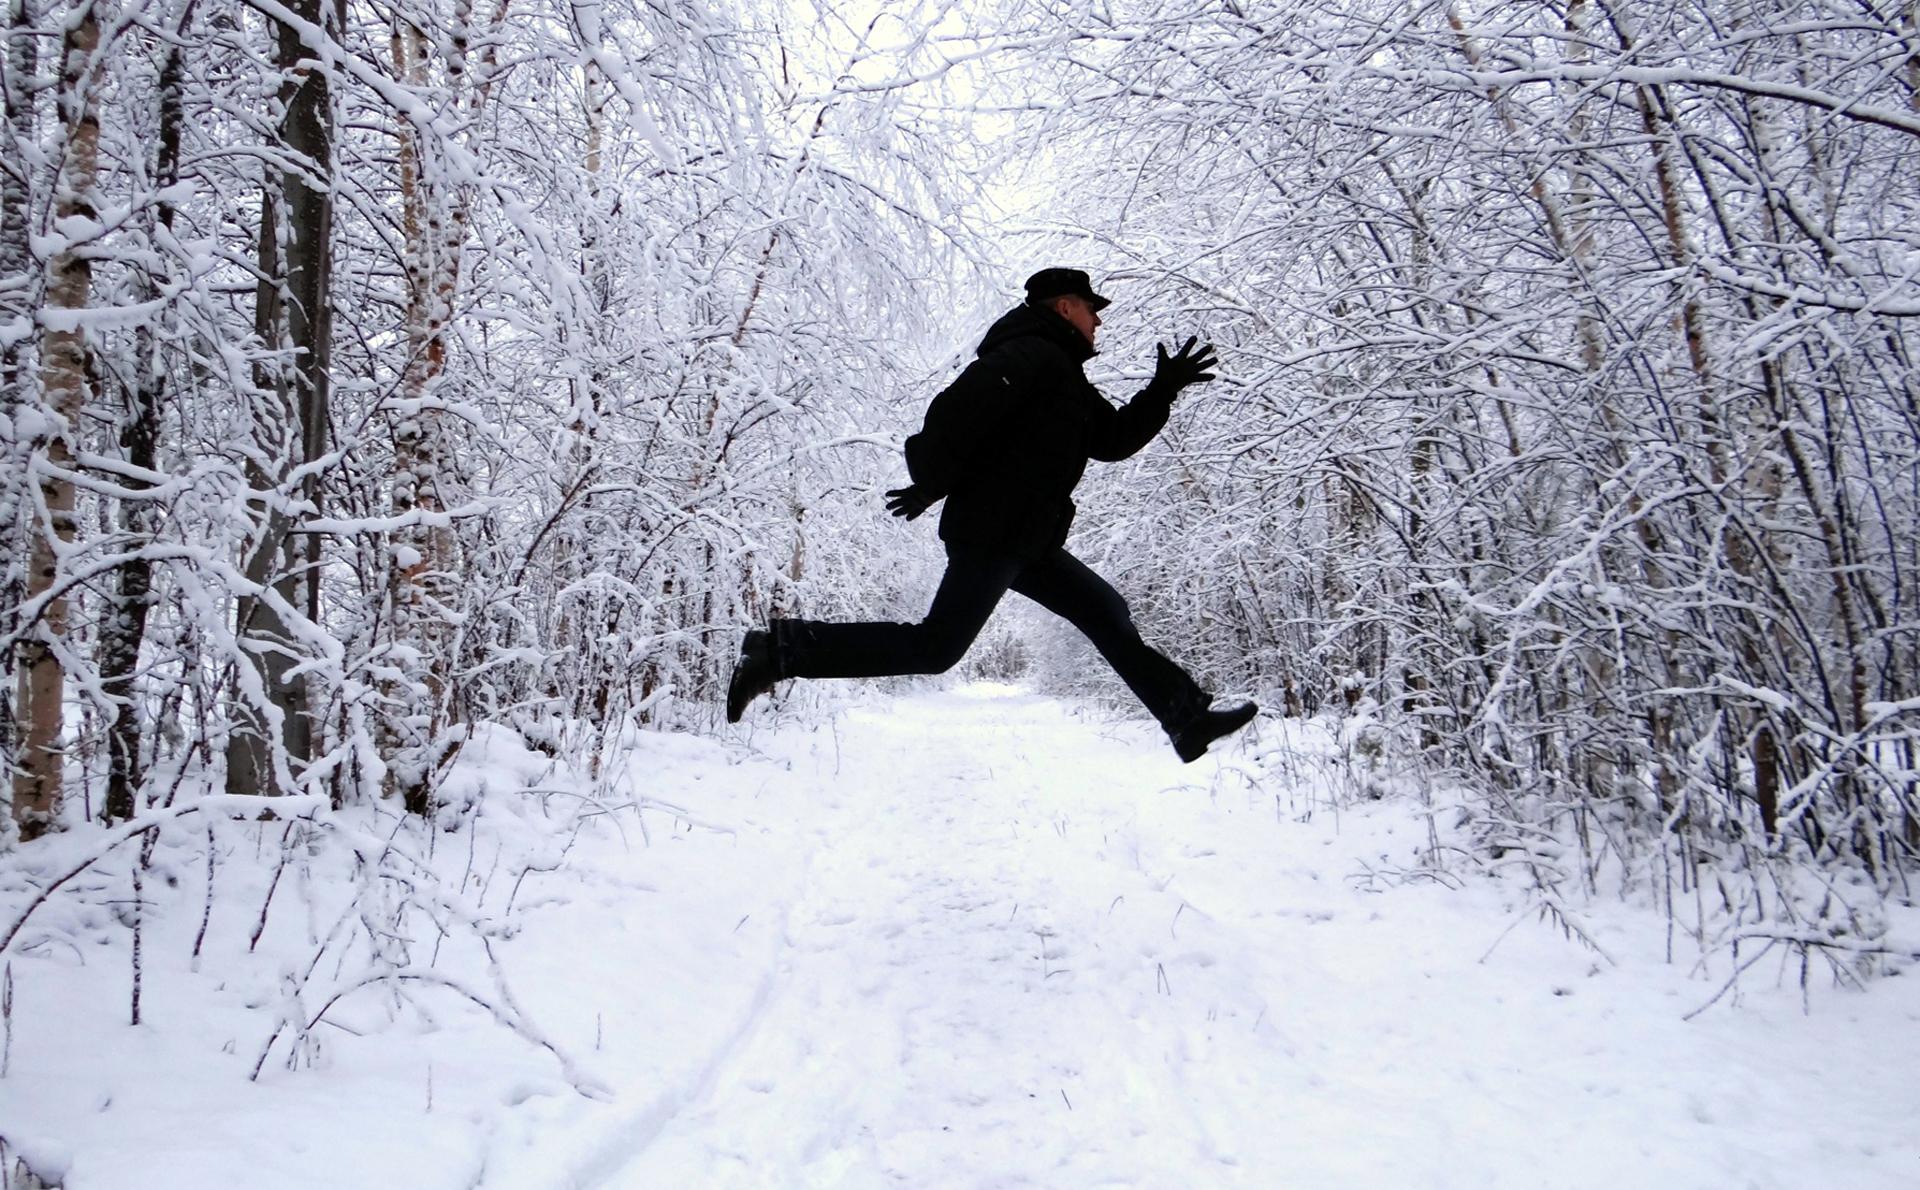 фото мужчина зимой в лесу амстердаму необходим как